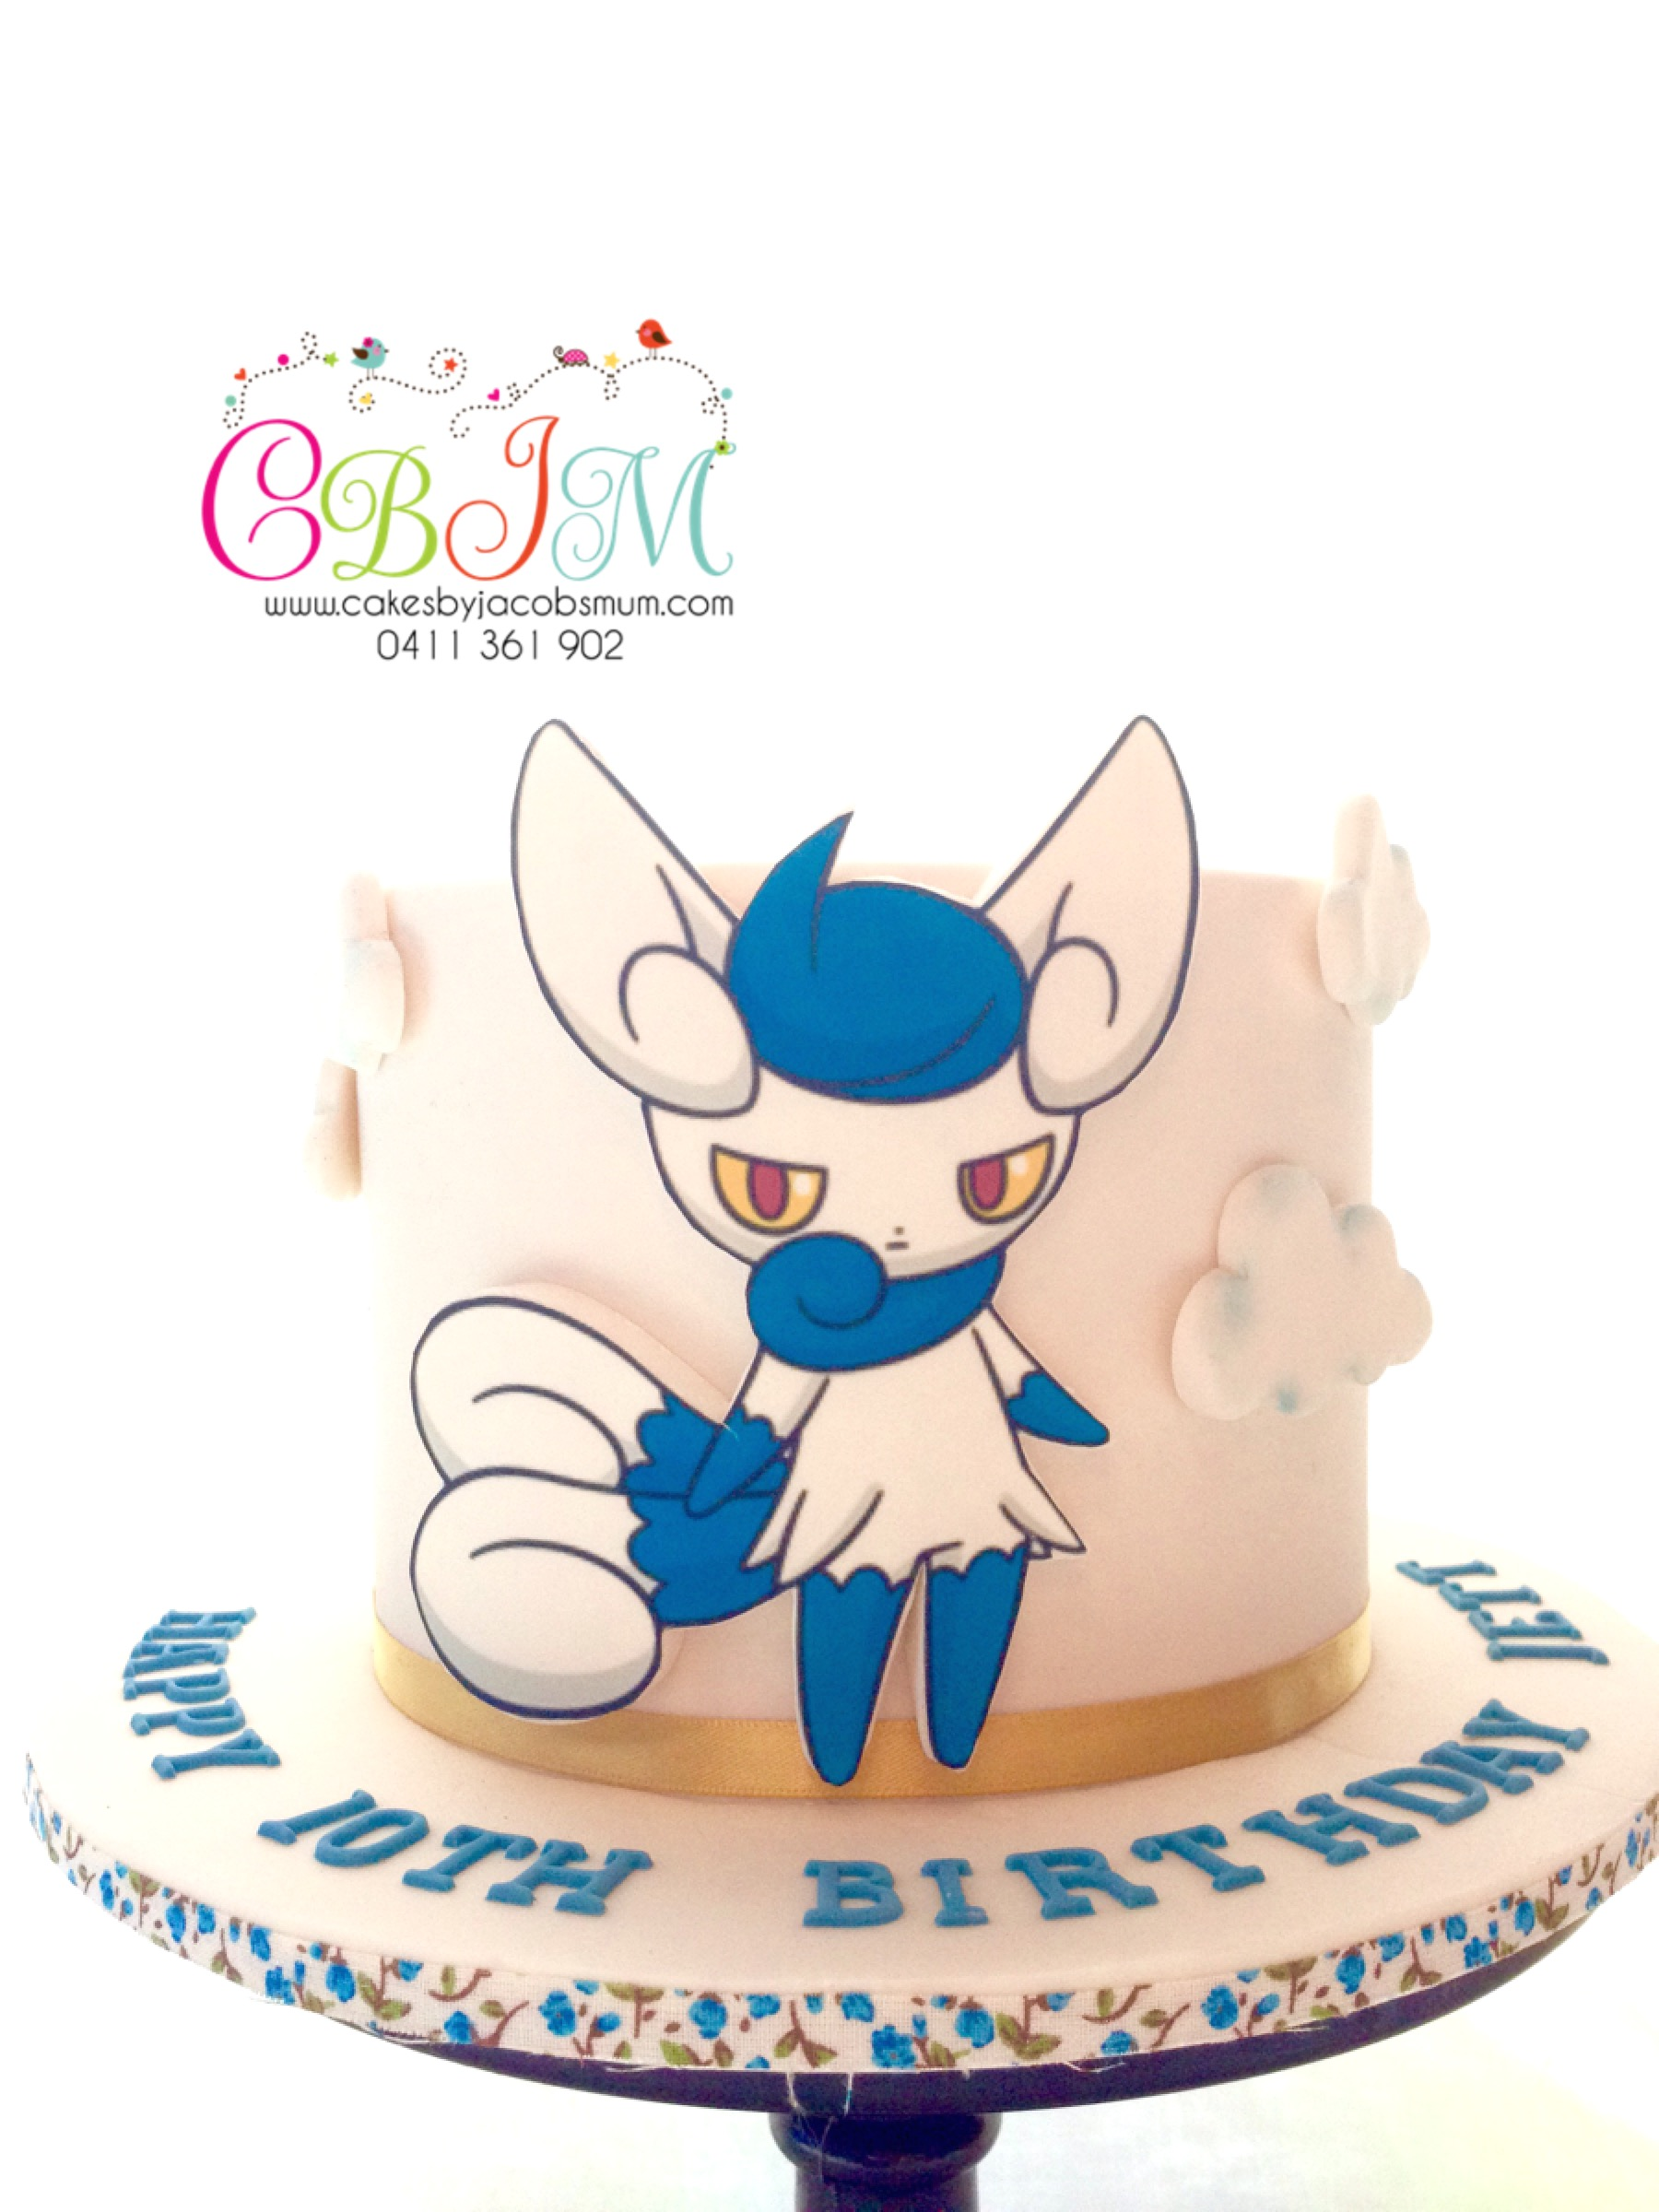 Meowstic Pokemon Cake